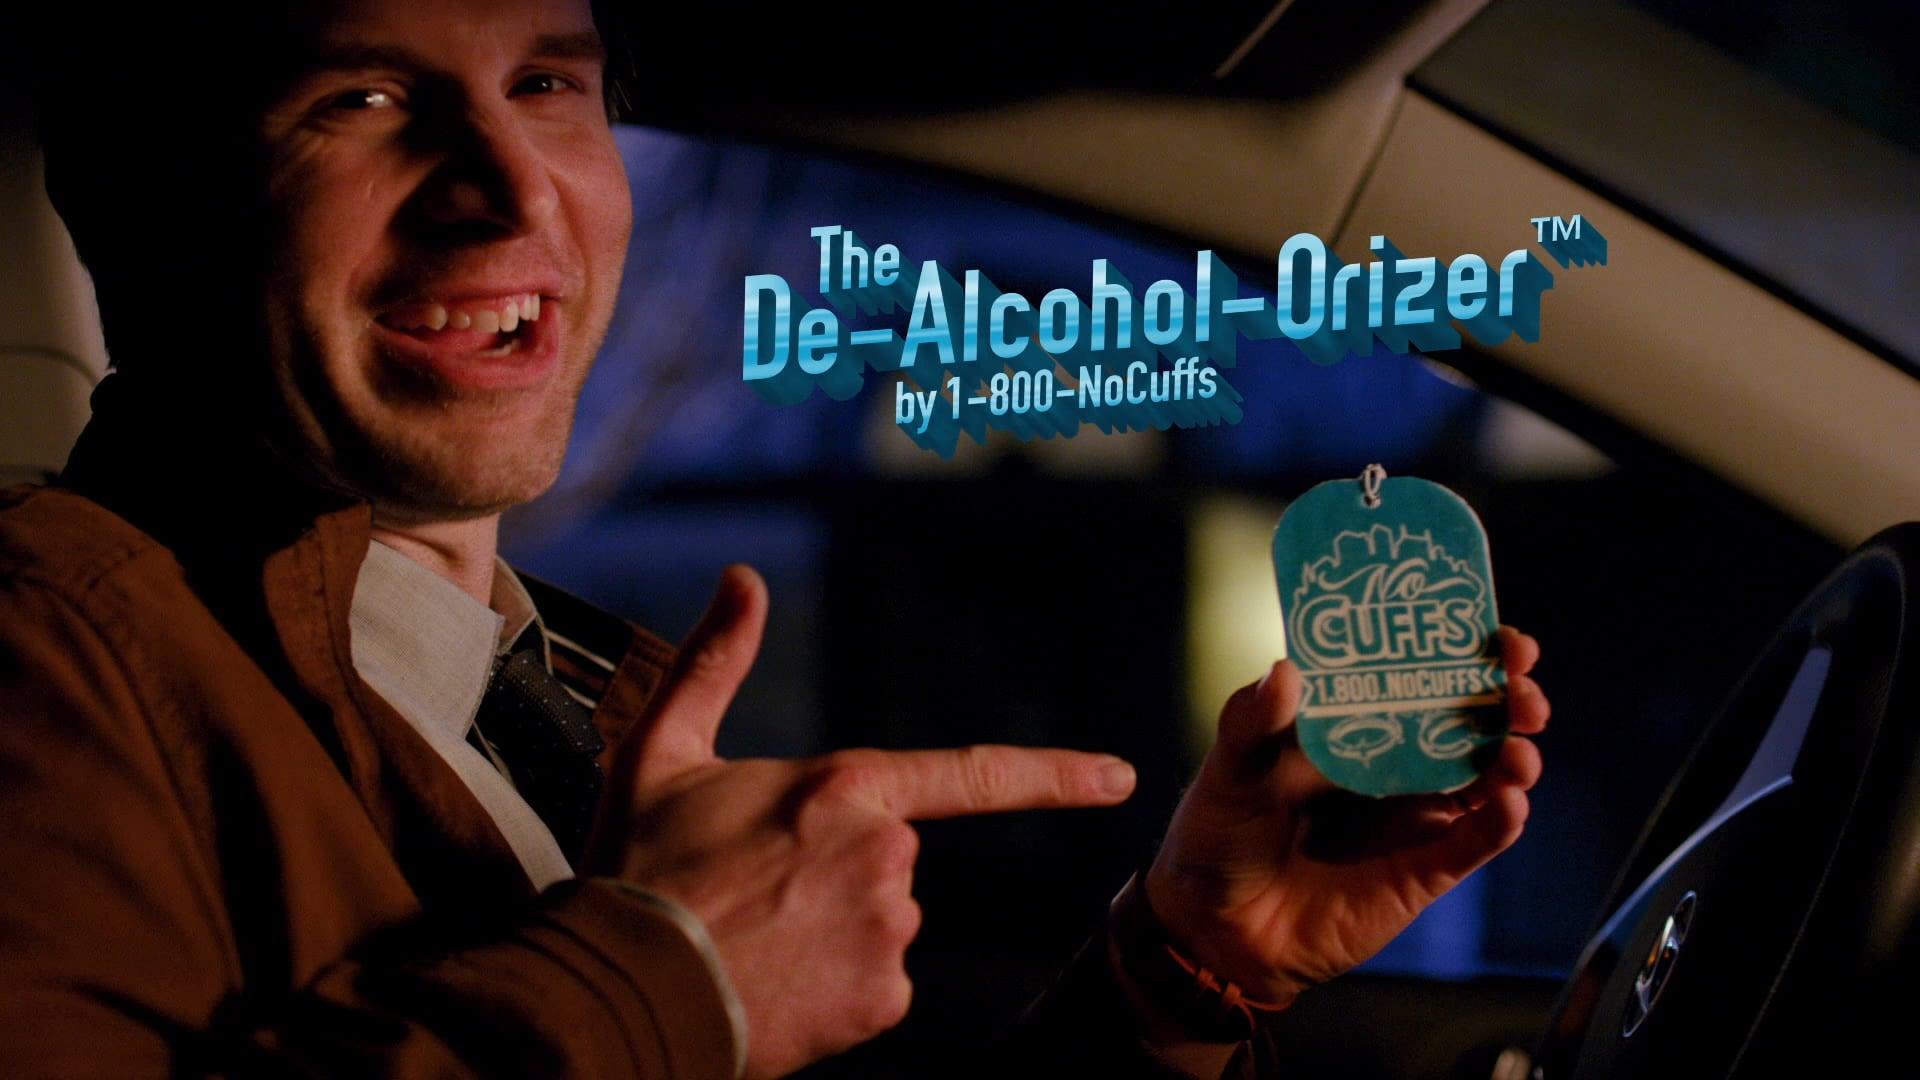 1-800-NoCuffs - The De-Alcohol-Orizer :60 TV